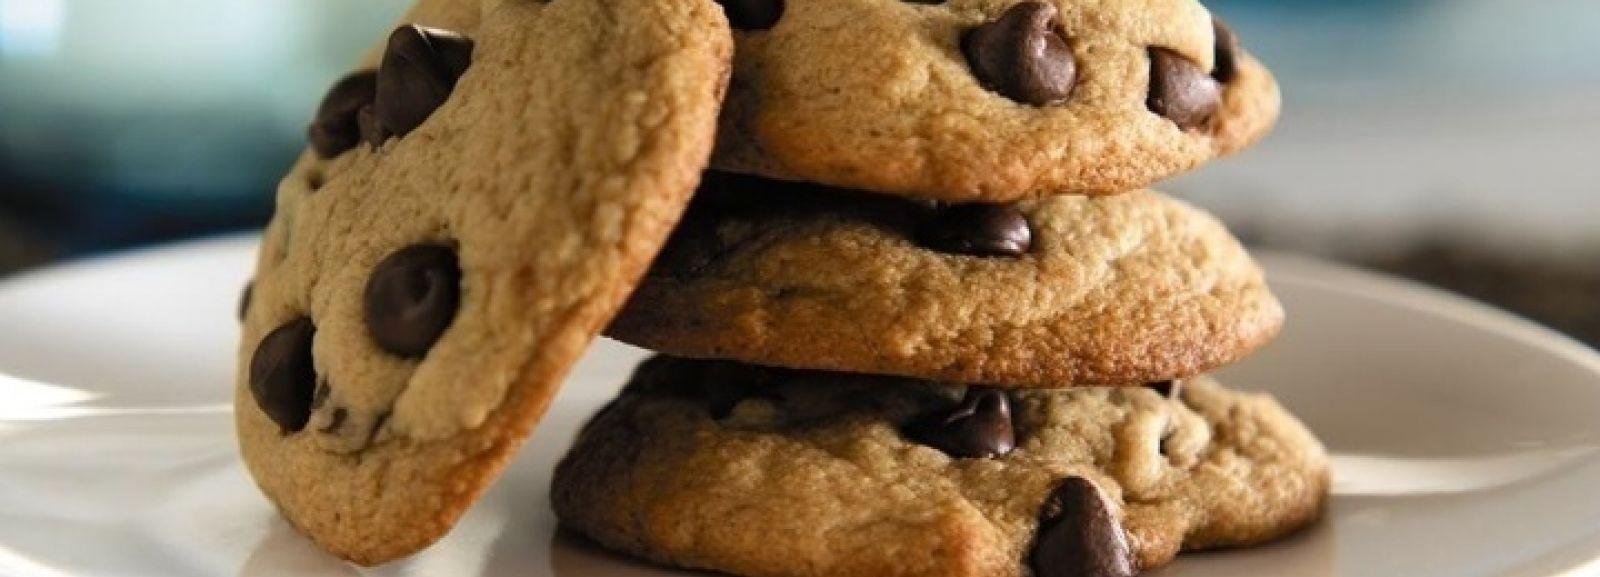 Chocolate chip cookies recipe no calorie sweetener